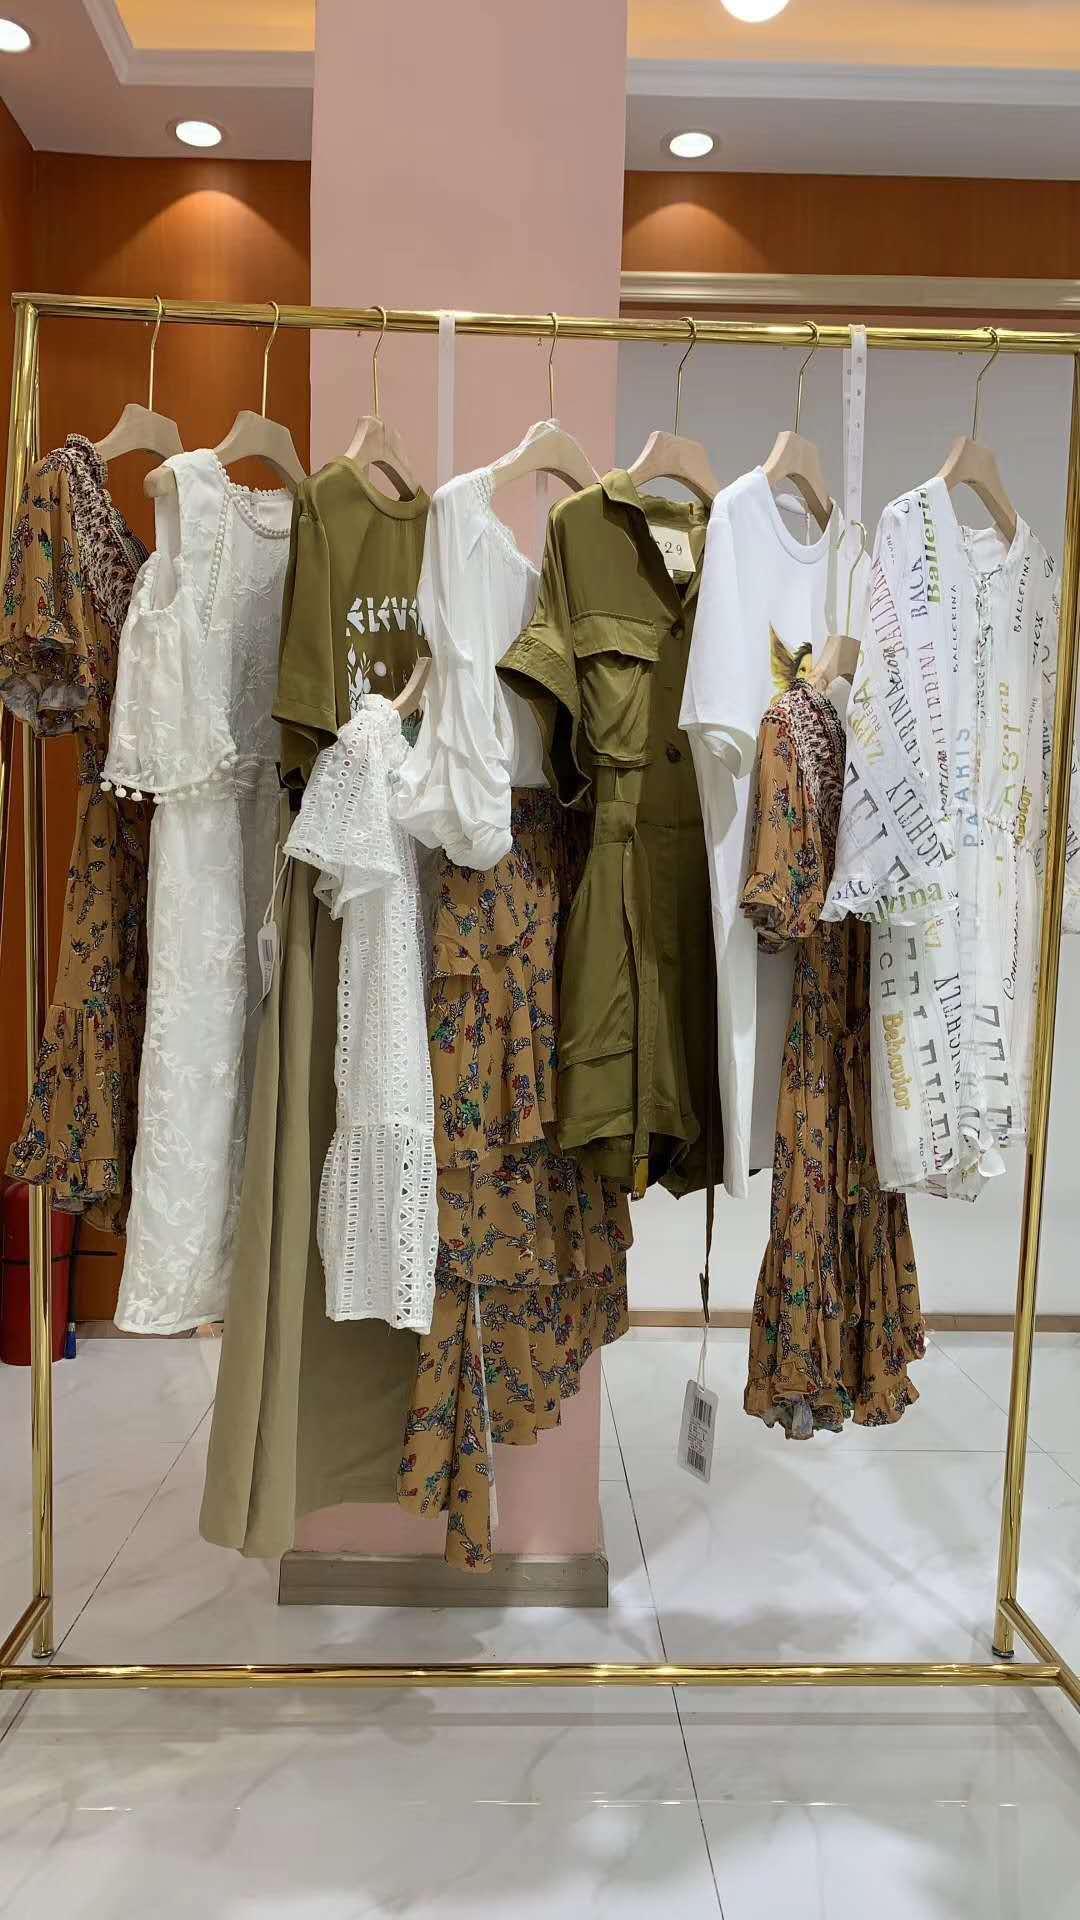 z11女装是什么档次(z11的衣服为什么那么贵)